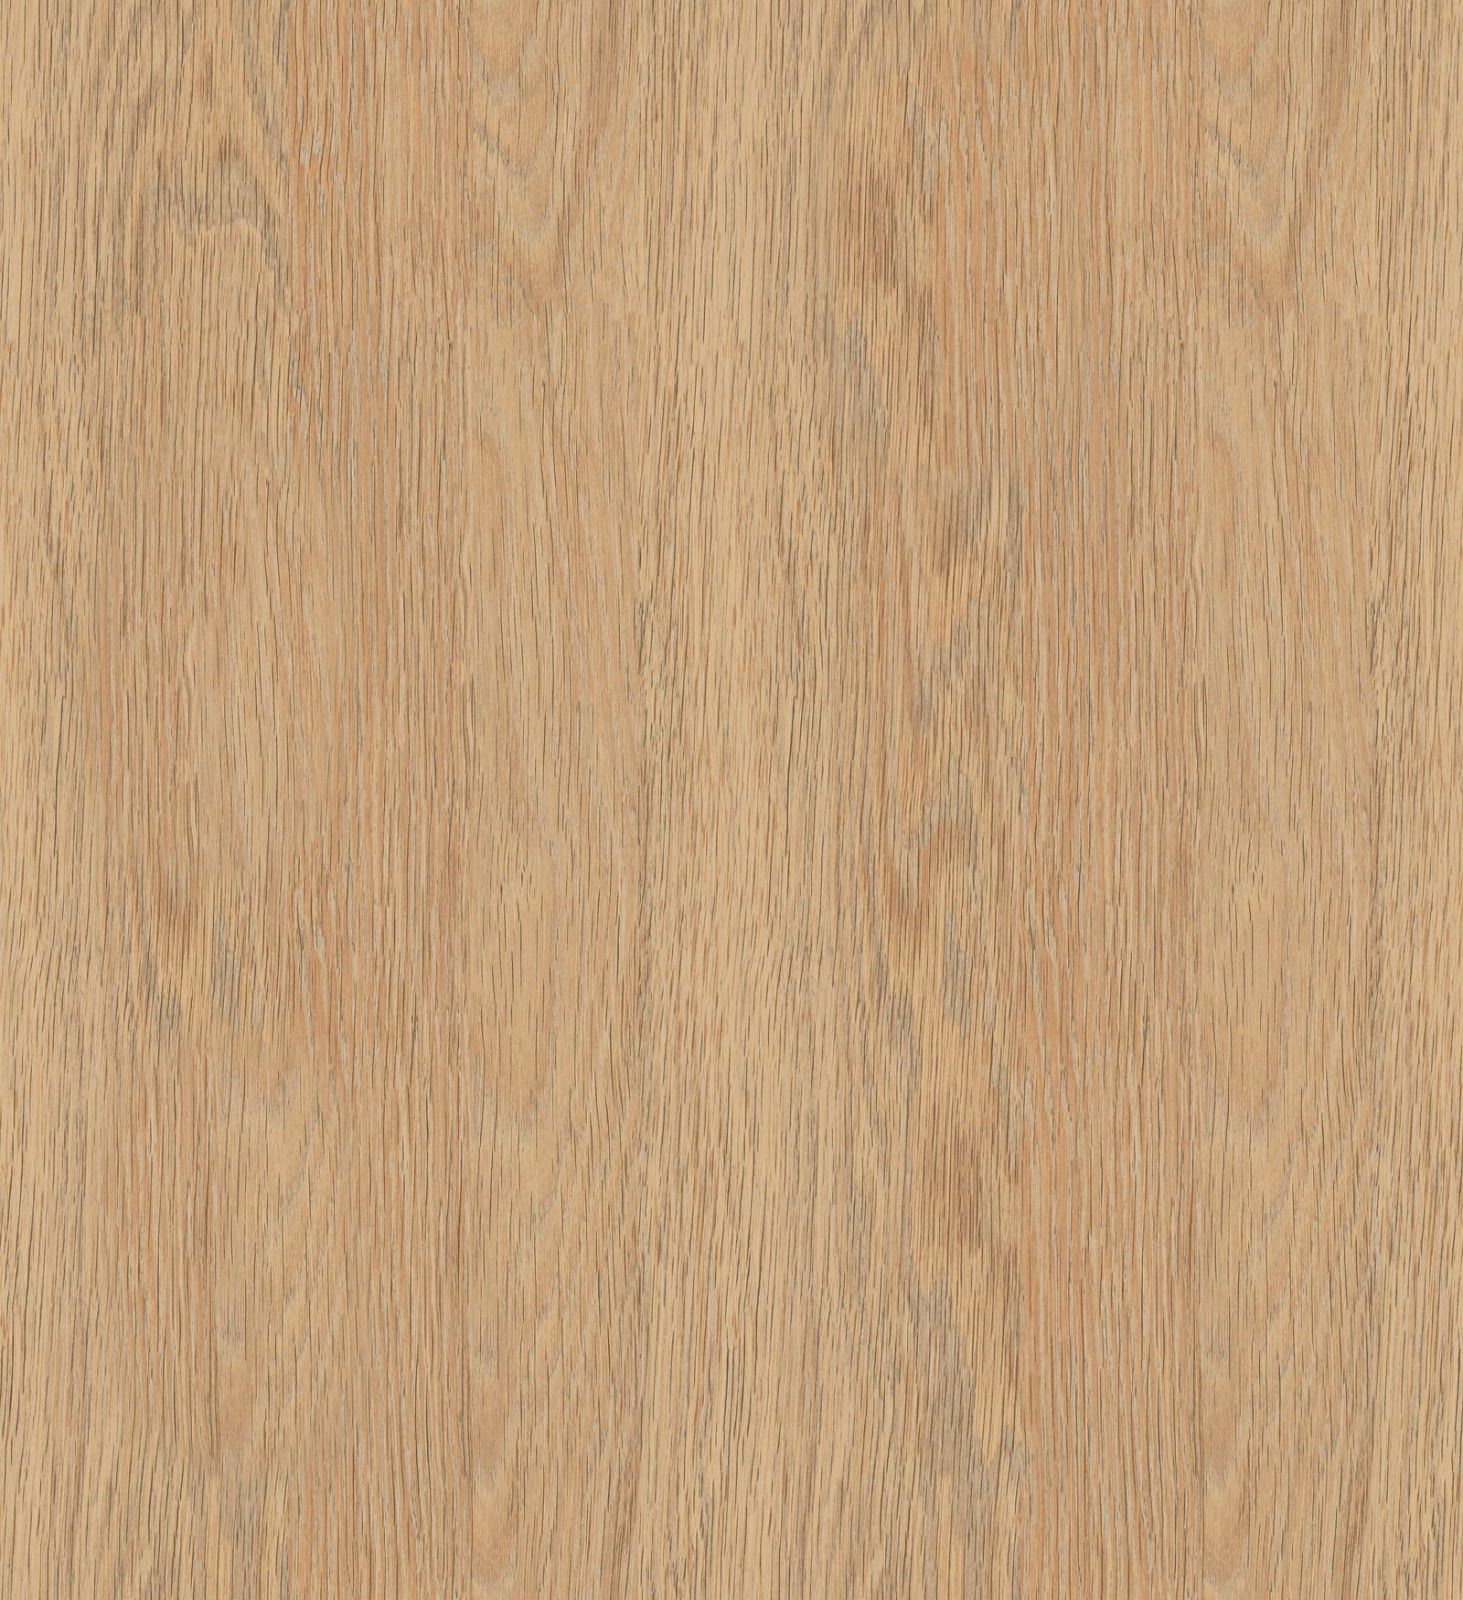 Wood Texture seamless wood fine sabbia texture | texturise | textures